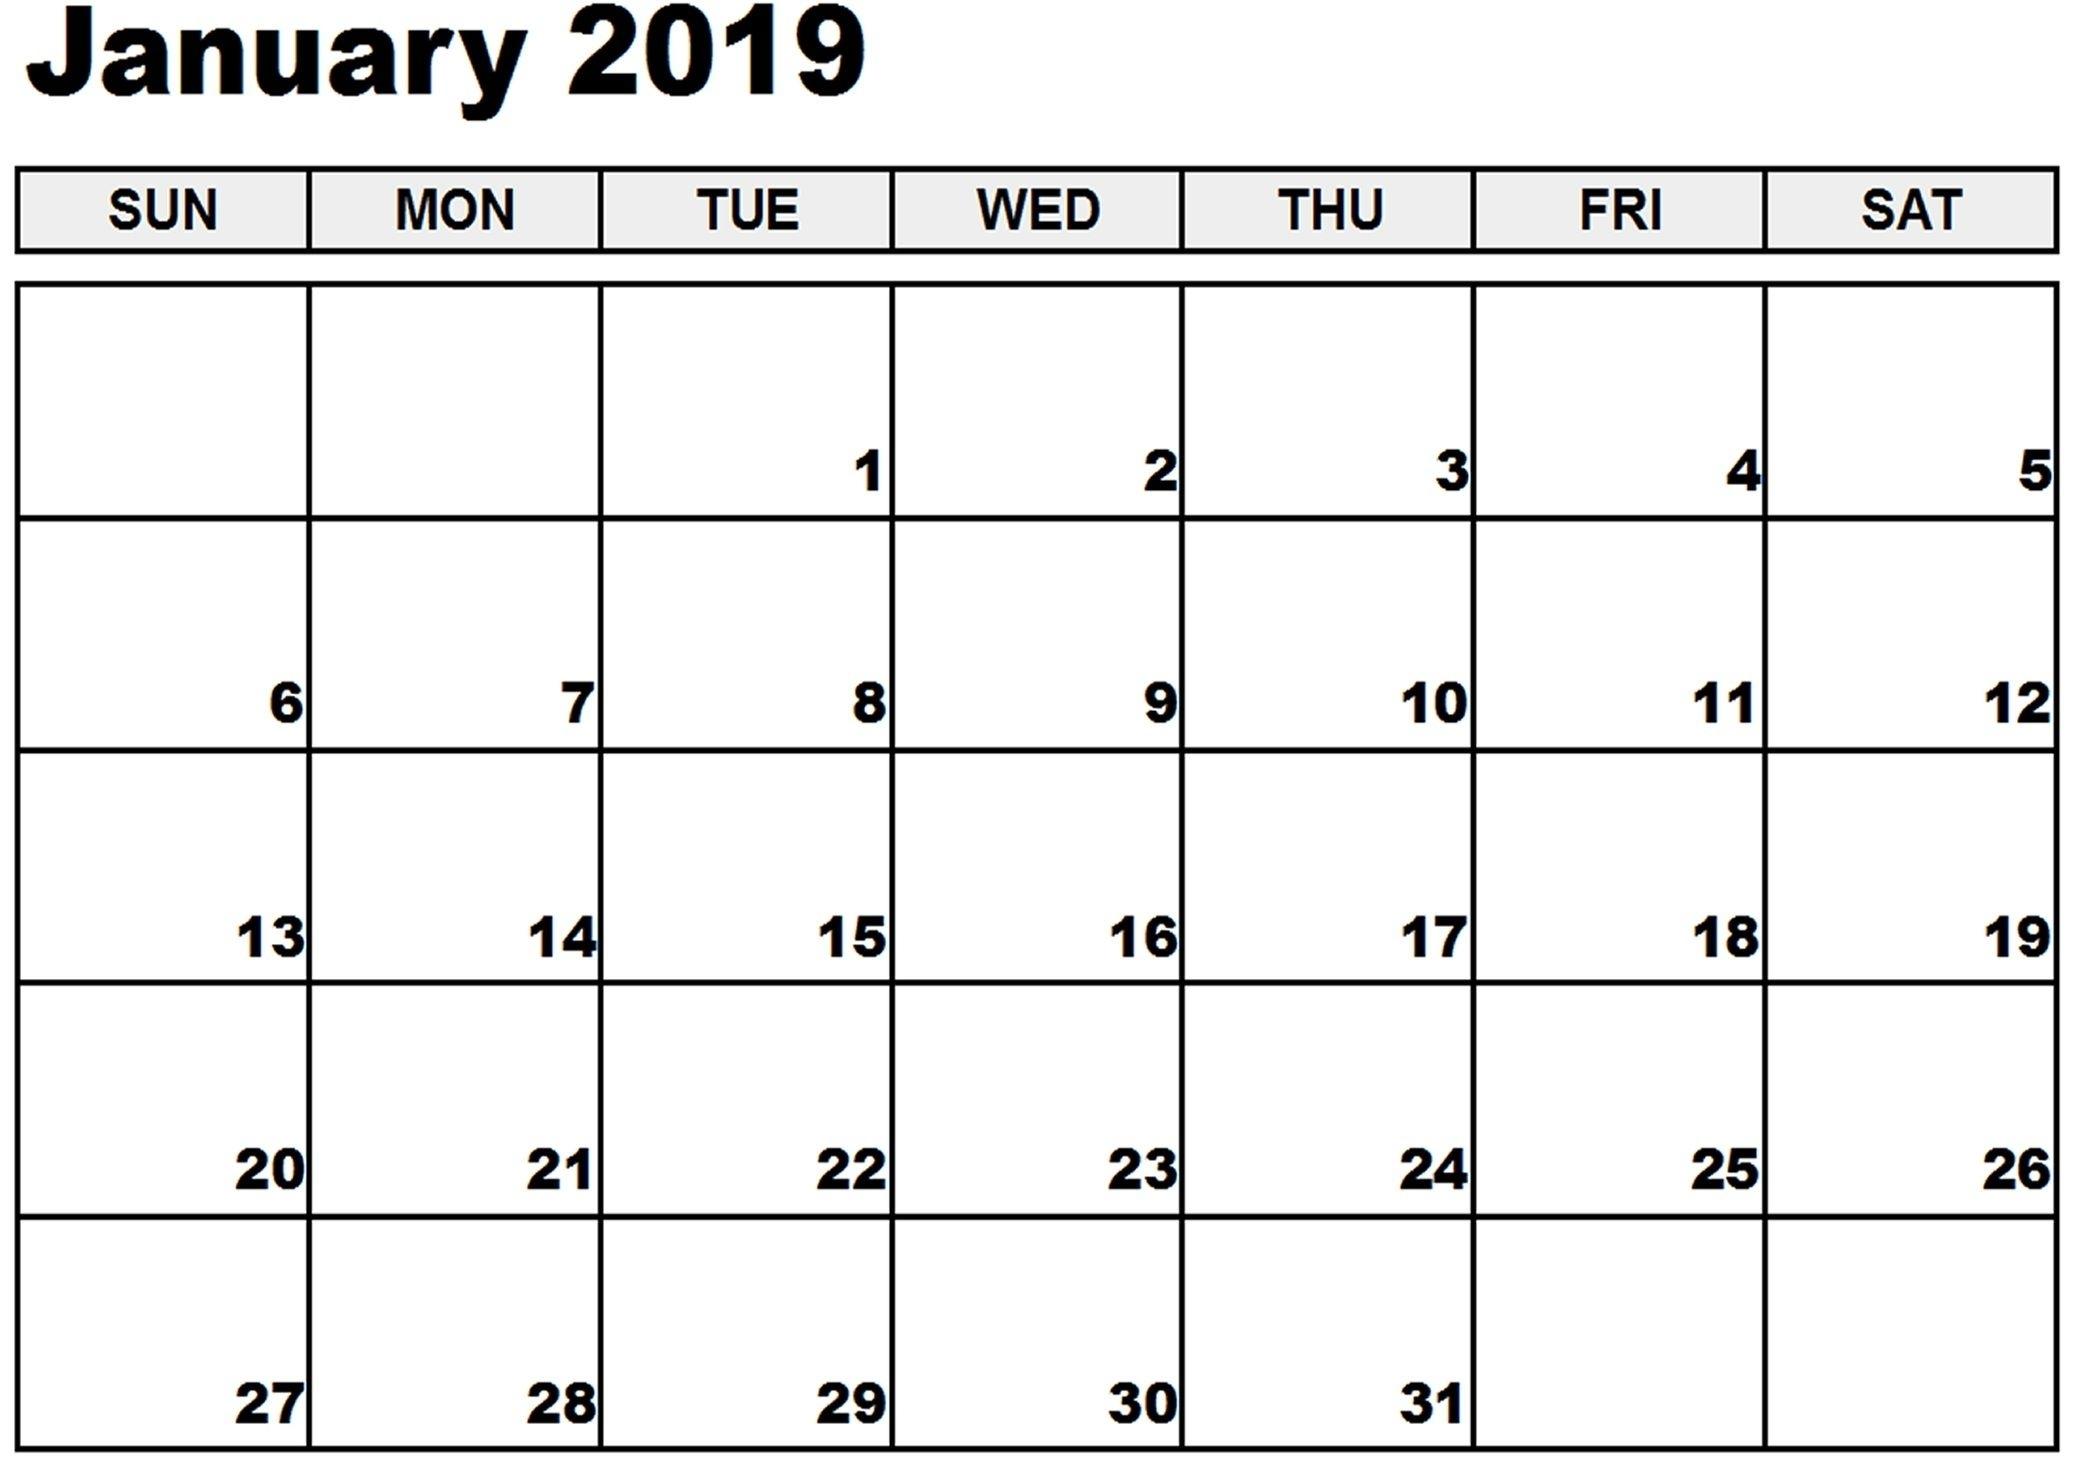 January 2019 Printable Calendar January 2019 Calendar intended for Fill In Calendar 2019 Printable